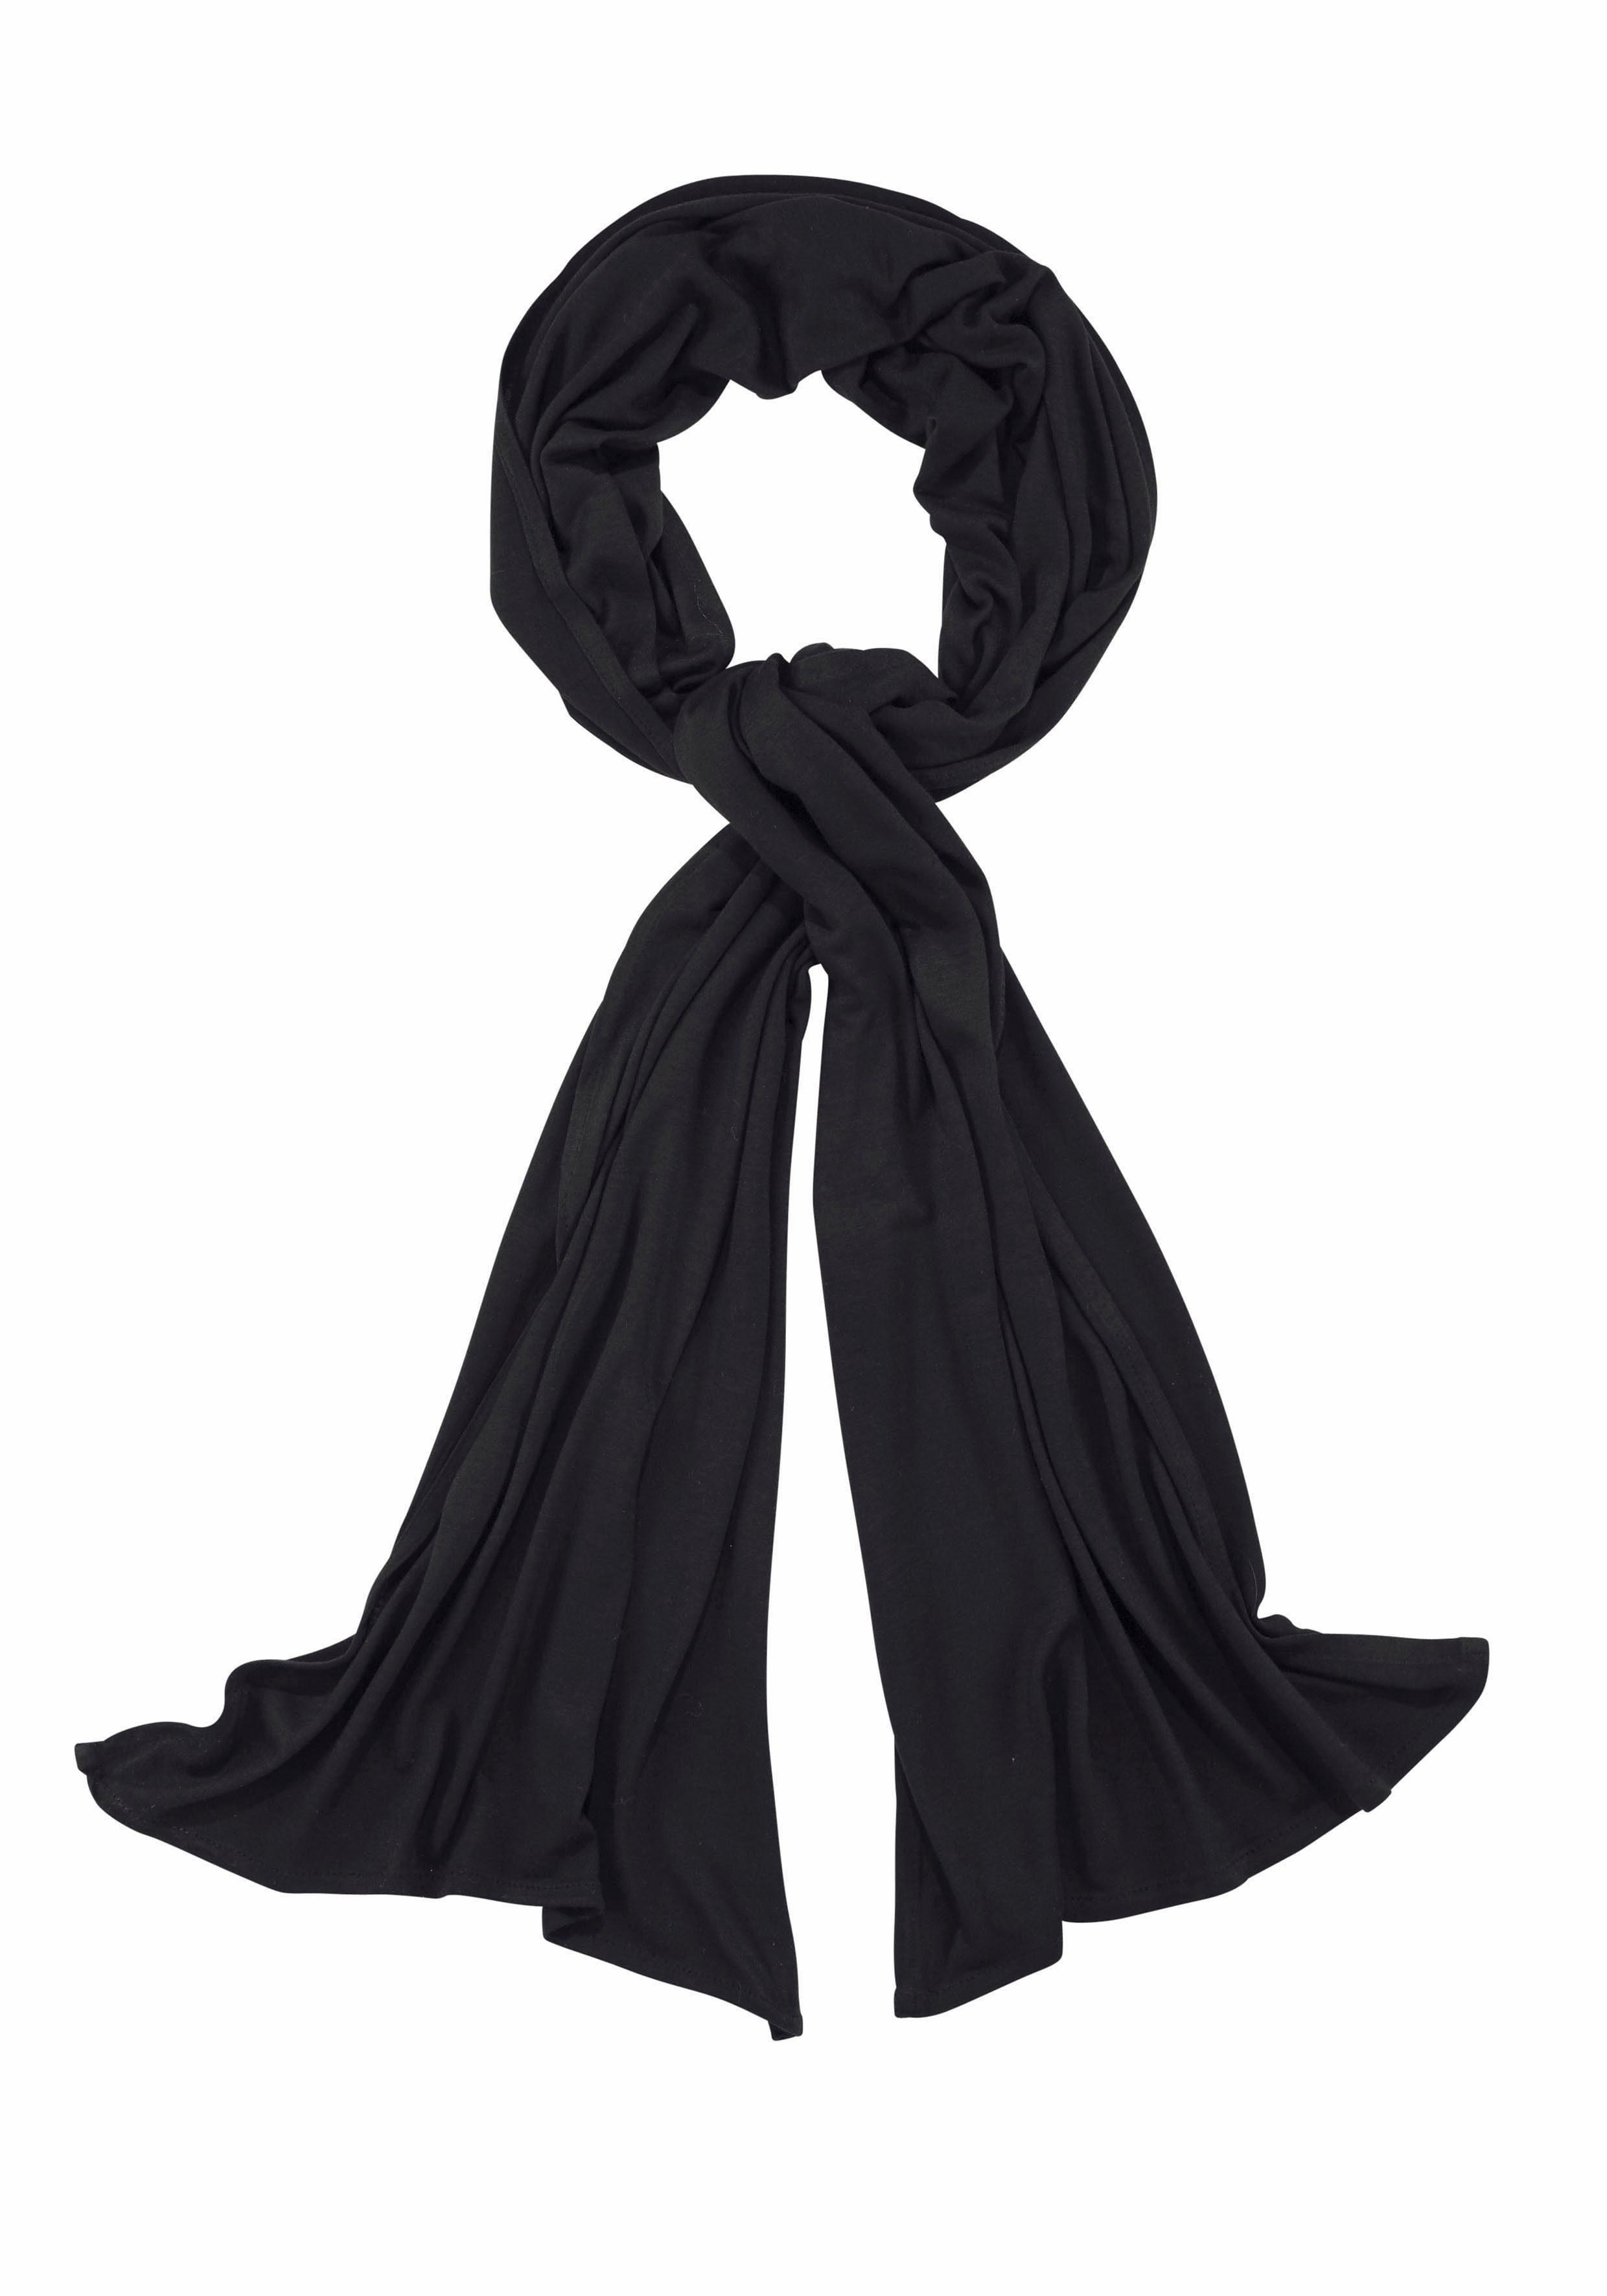 J. Jayz Modeschal aus weichem Material